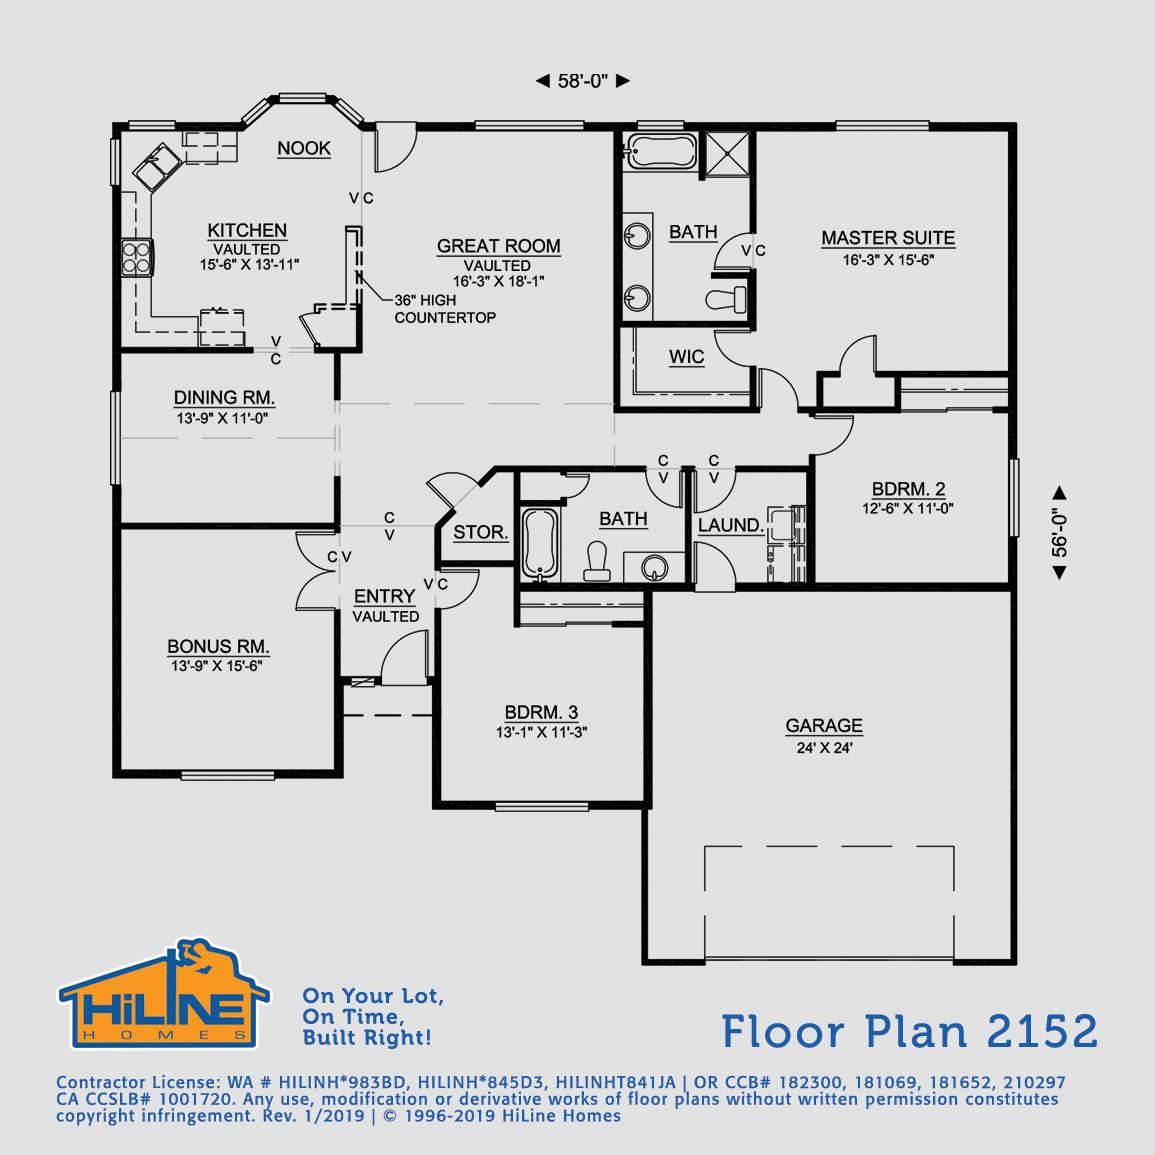 Floorplan 2152